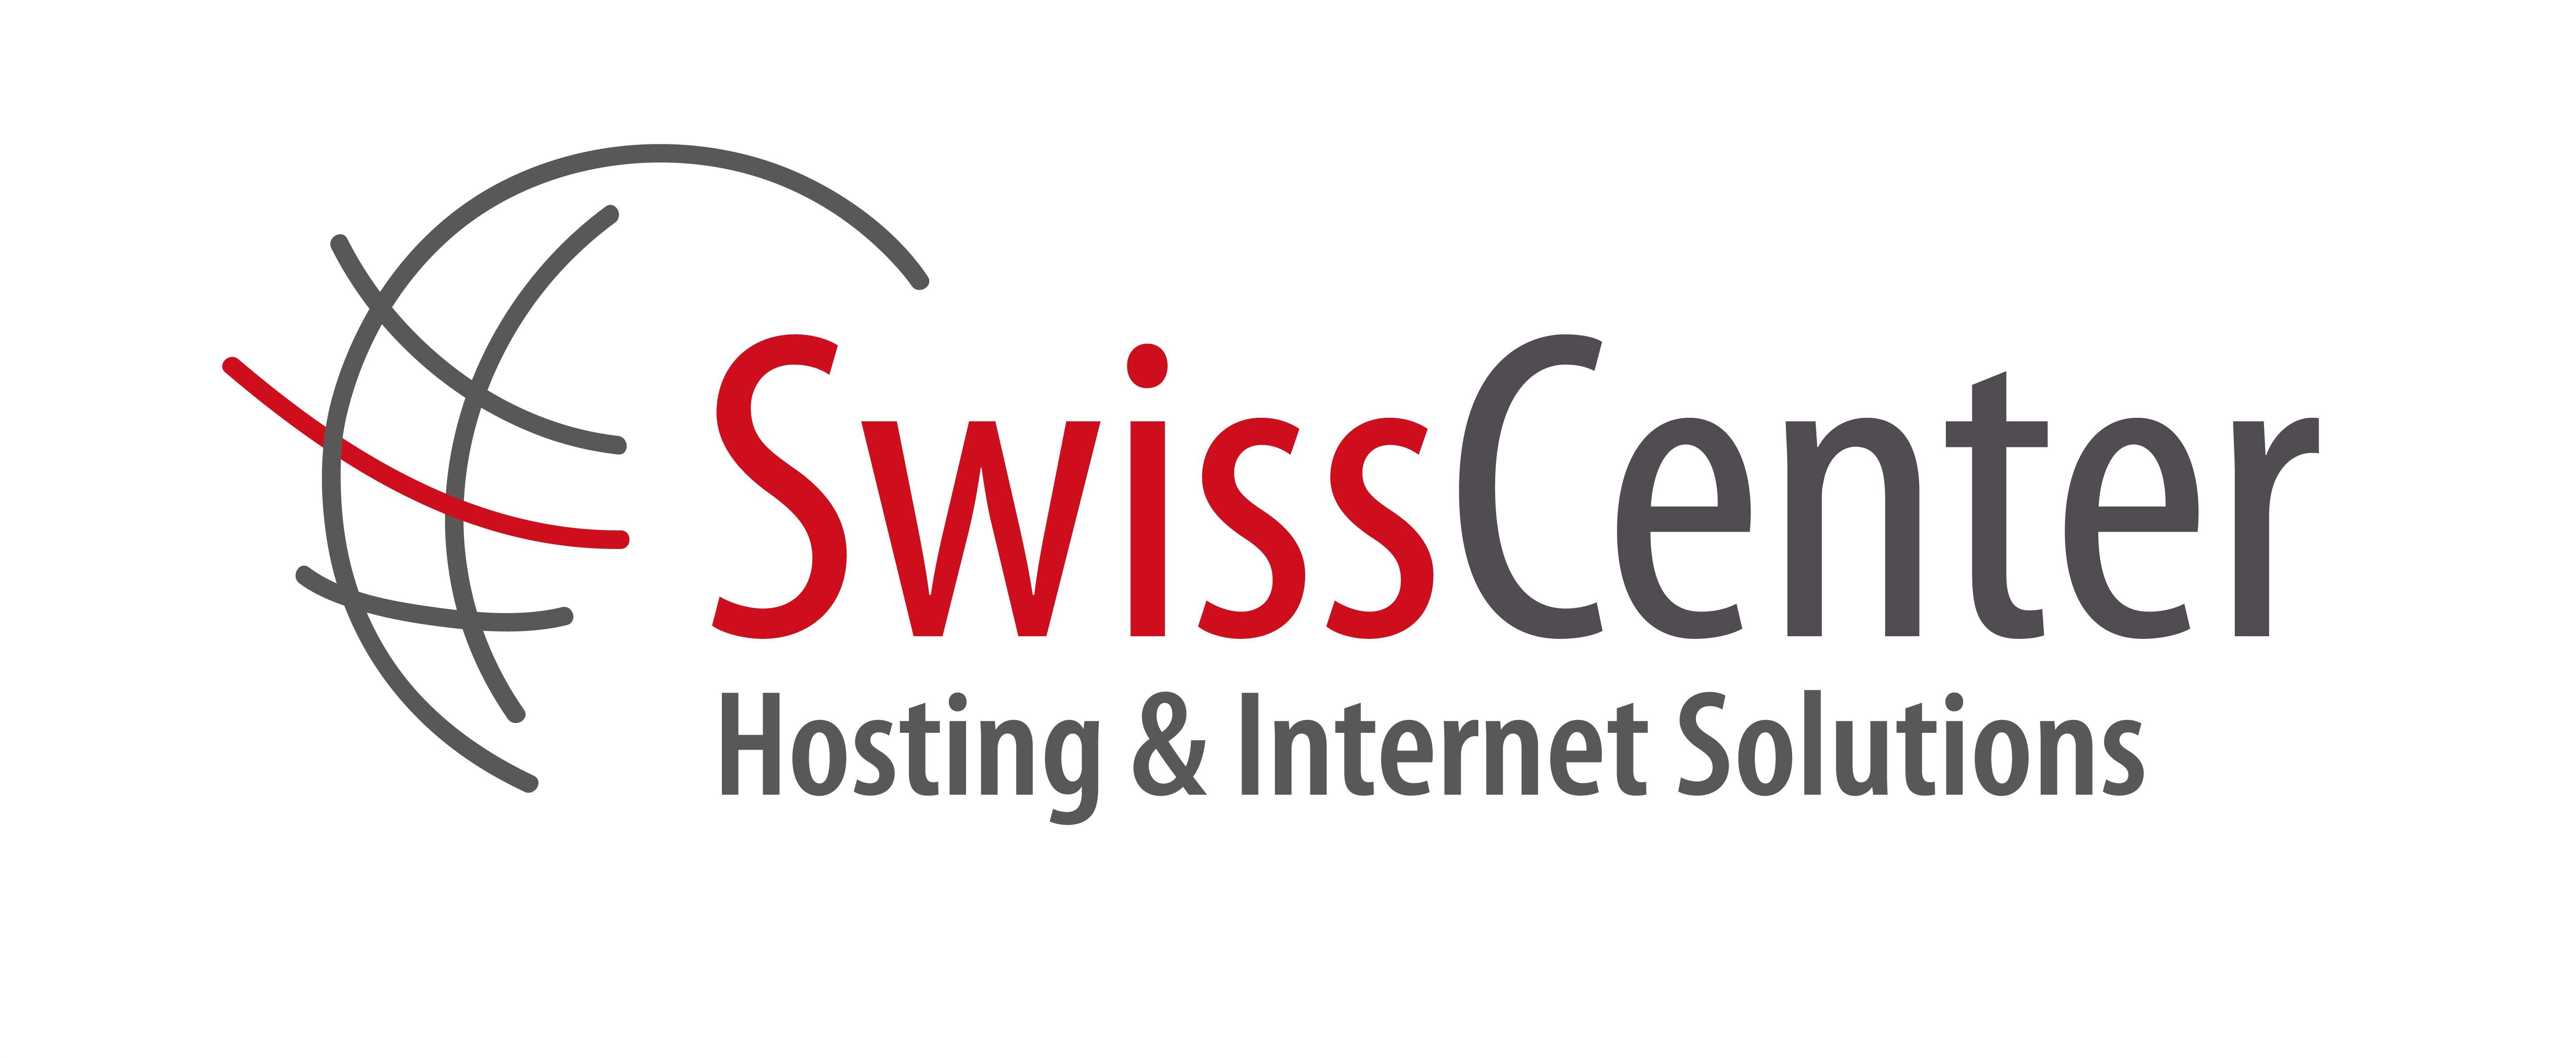 SwissCenter Partenaire